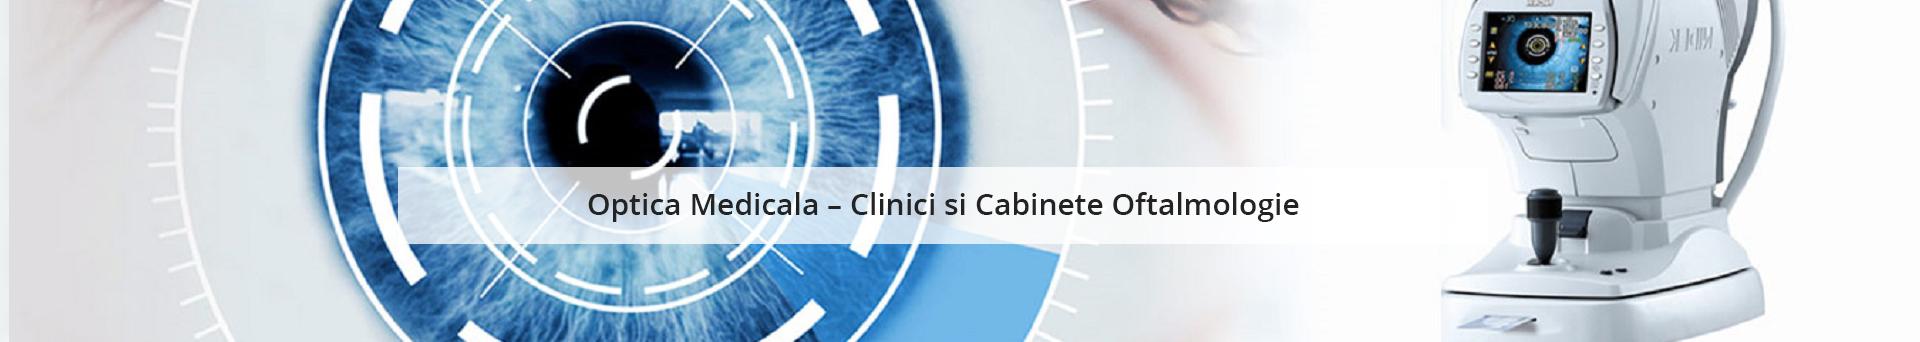 Optica Medicala – Clinici si Cabinete Oftalmologie